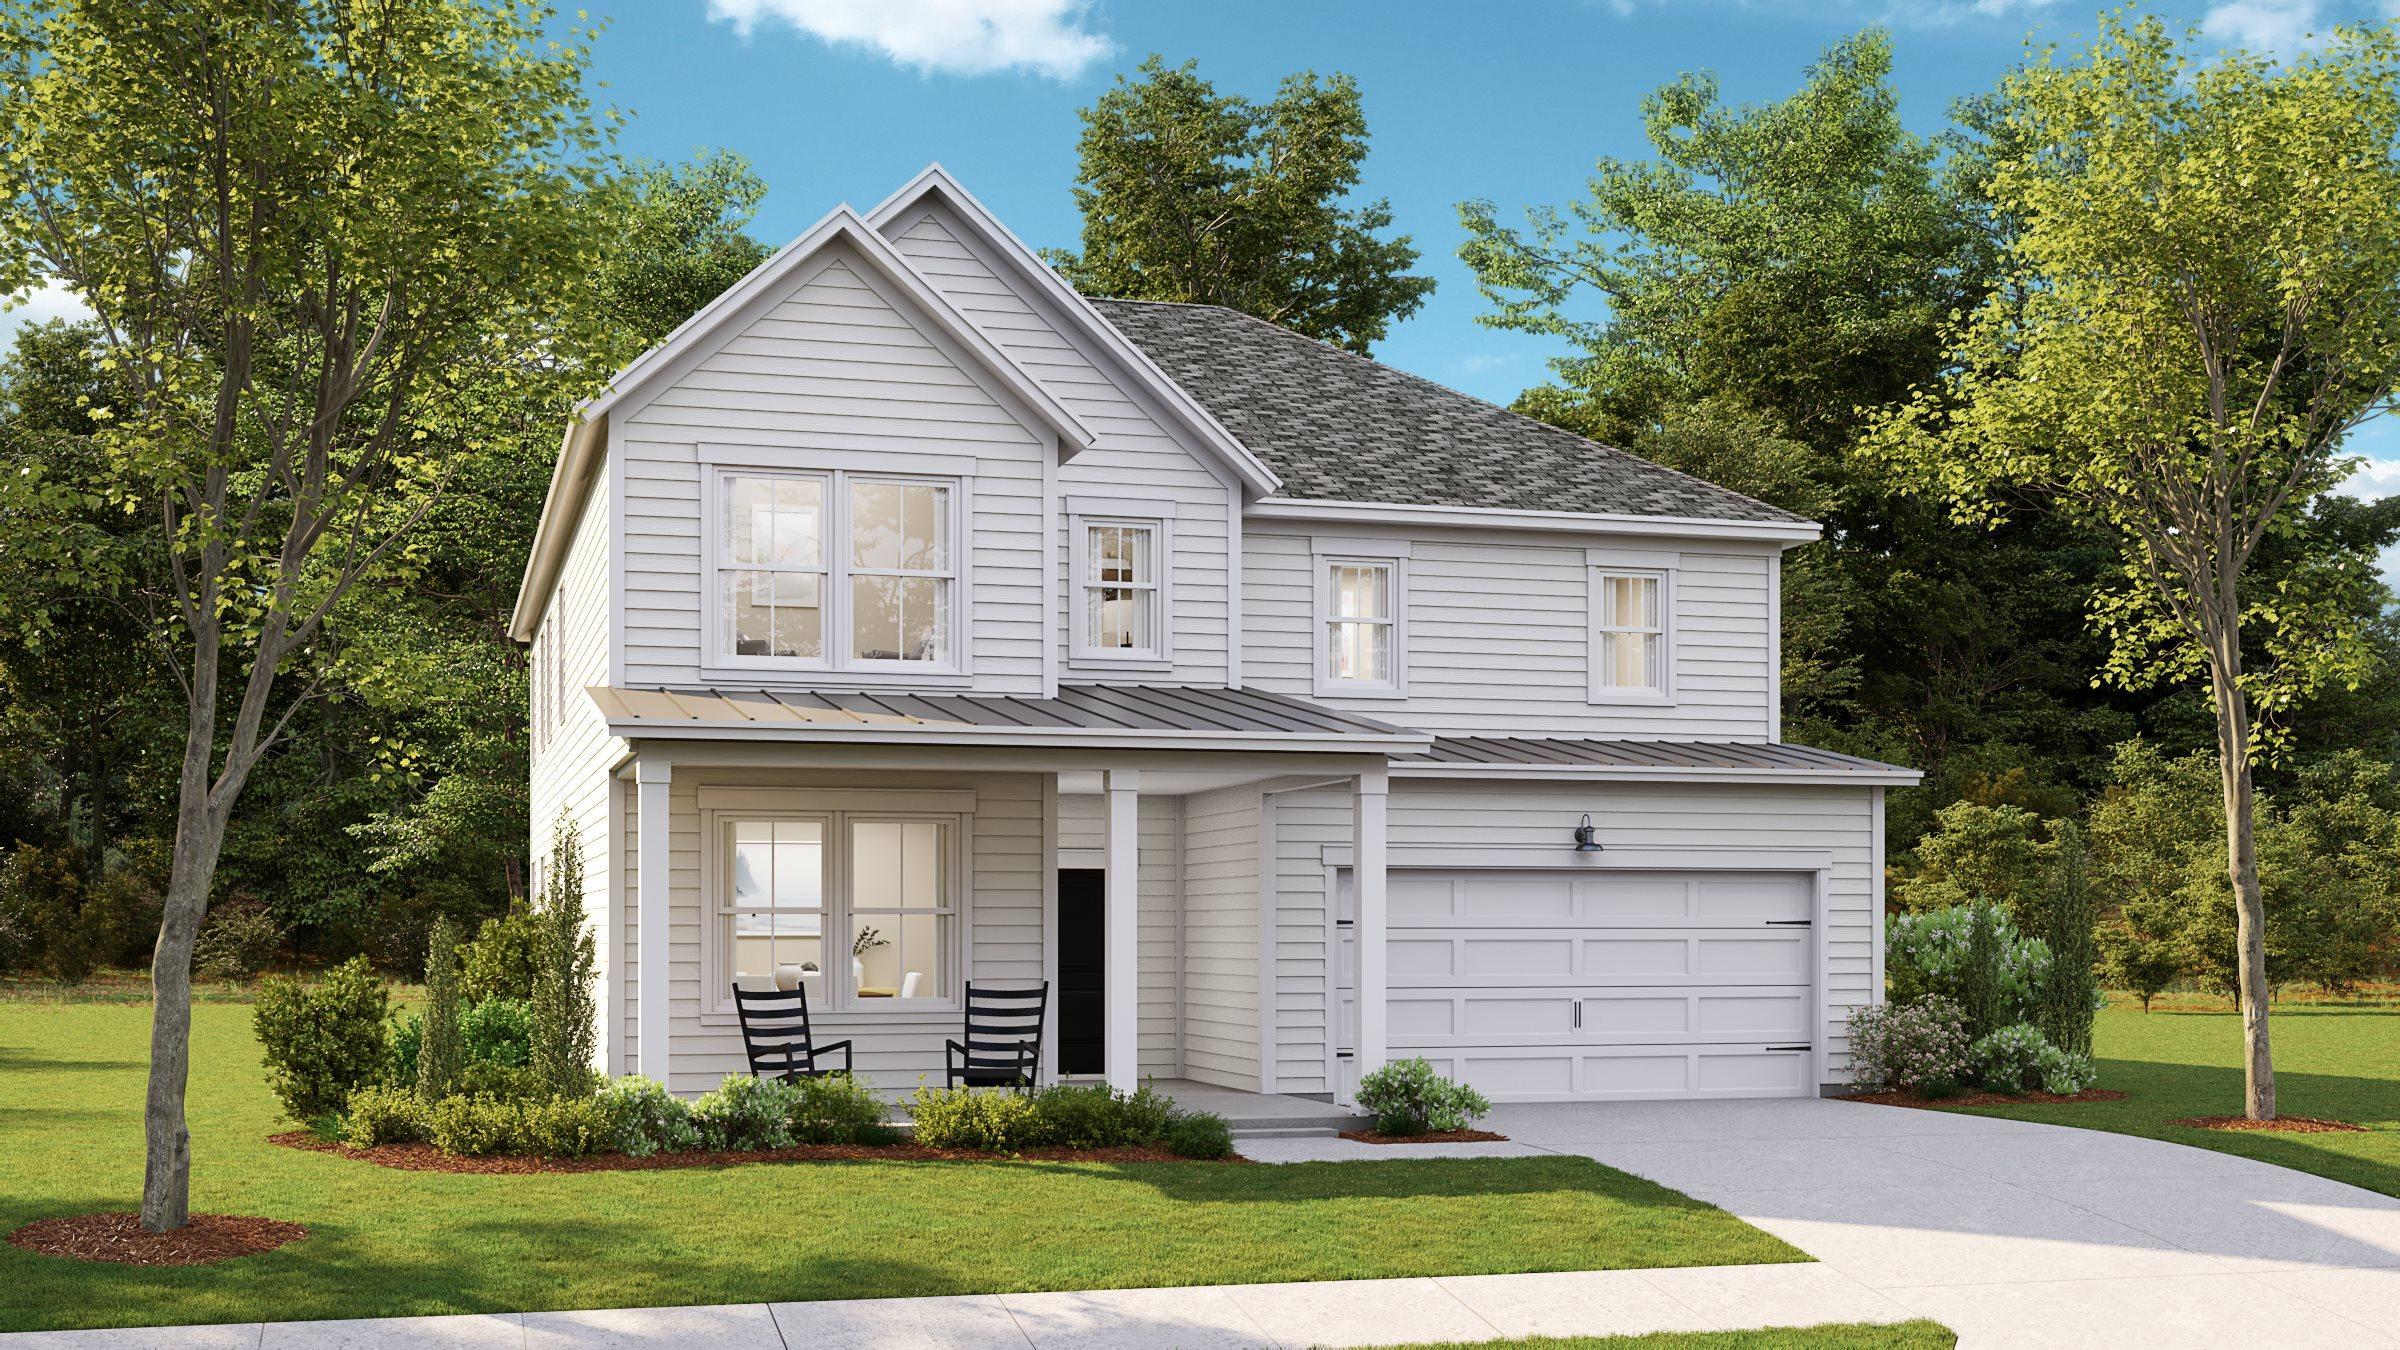 403 West Respite Lane Summerville, SC 29483